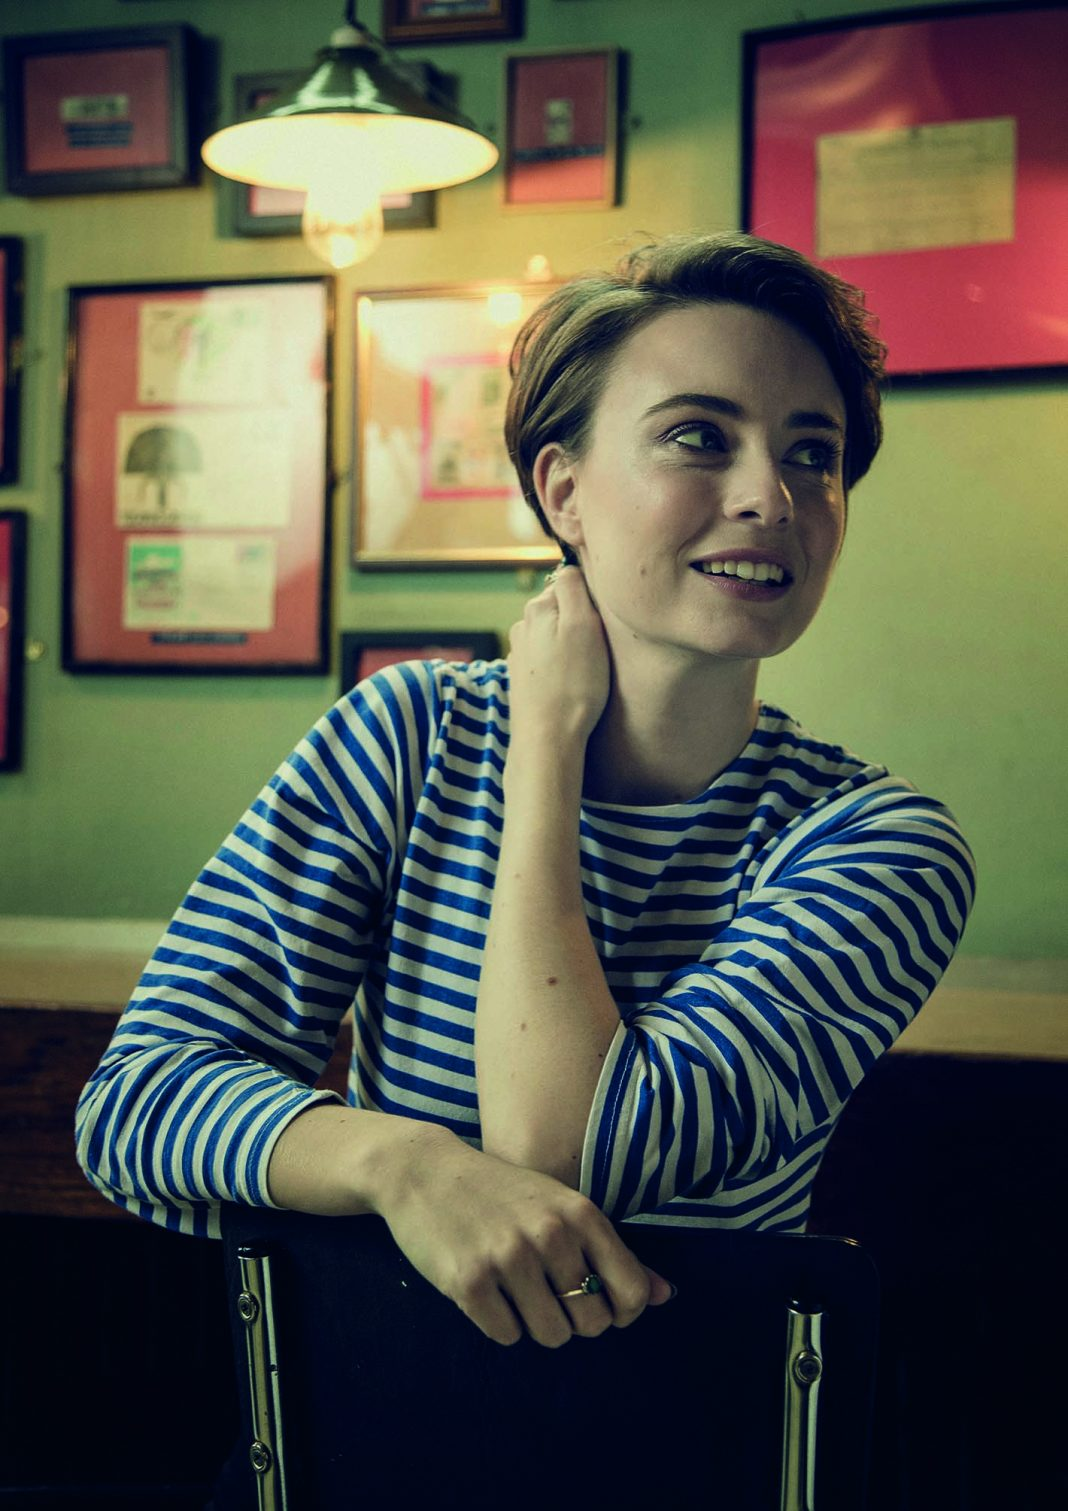 Image Credits: Photographer – Will Bremridge, Makeup – Charlotte Wood for Lancôme